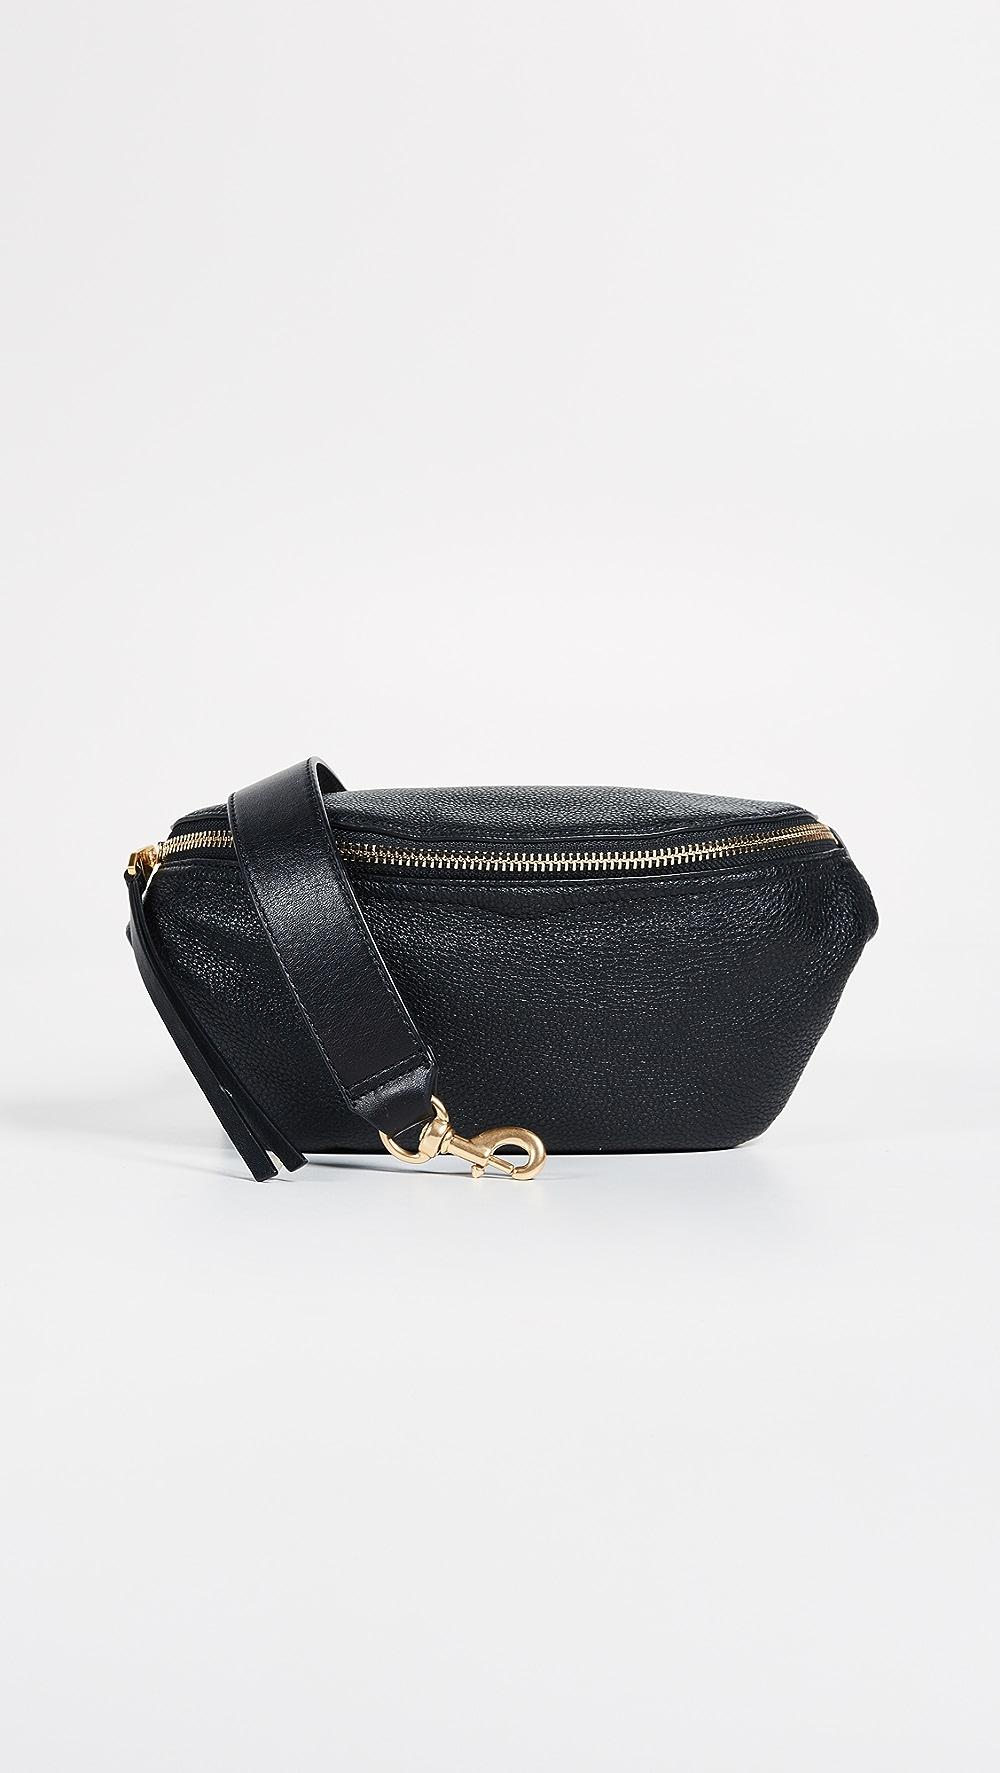 Responsible Rebecca Minkoff - Bree Belt Bag Elegant Appearance